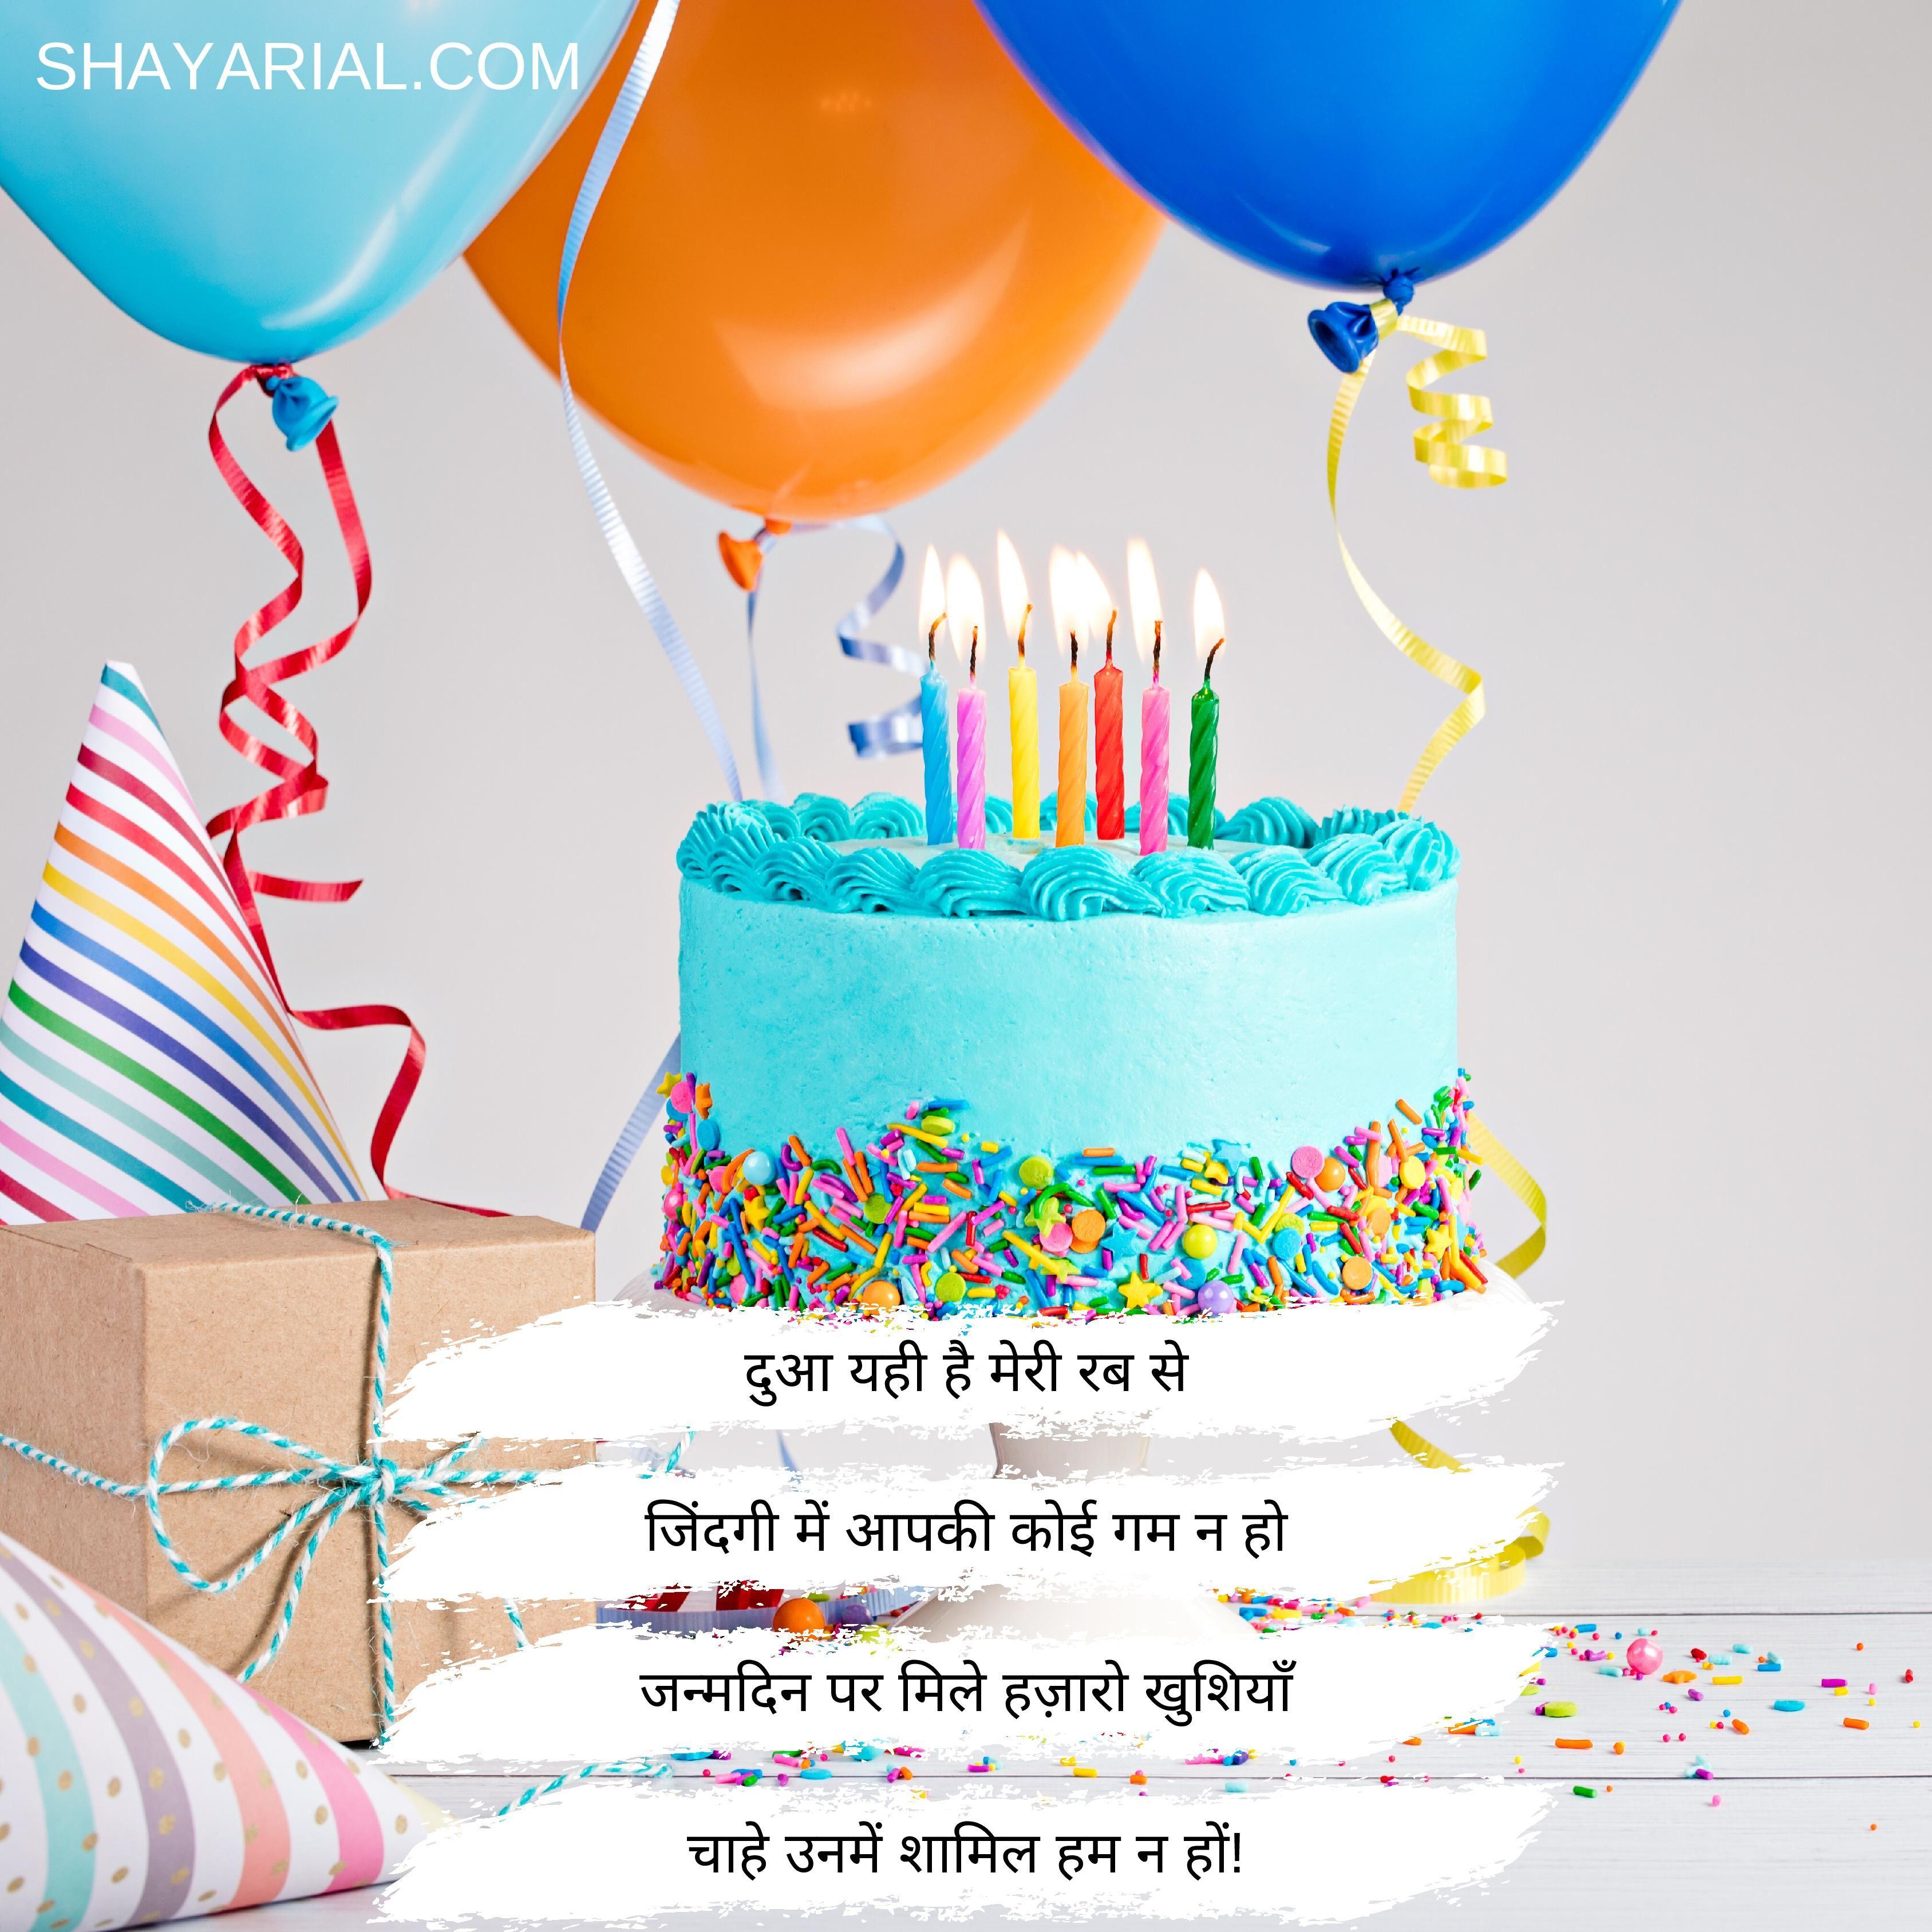 Happy Birthday Shayari In Hindi 2020 in 2020 Balloon